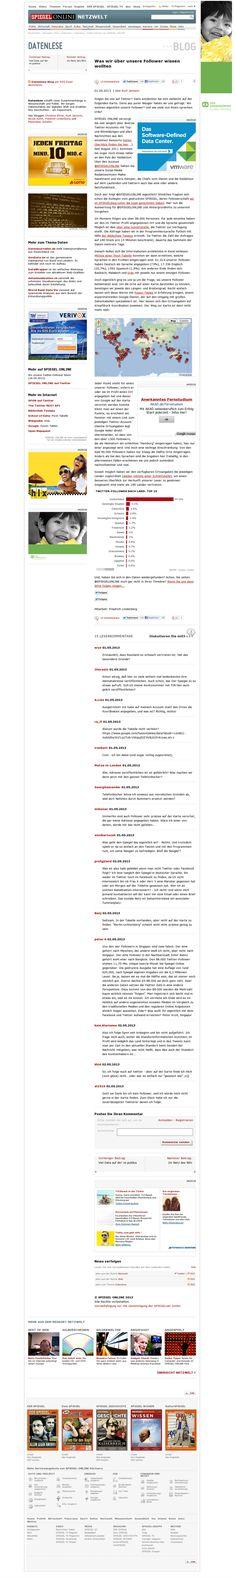 Twitter-Follower-Analyse http://www.spiegel.de/netzwelt/web/datenlese-twitter-follower-von-spiegel-online-a-896850.html